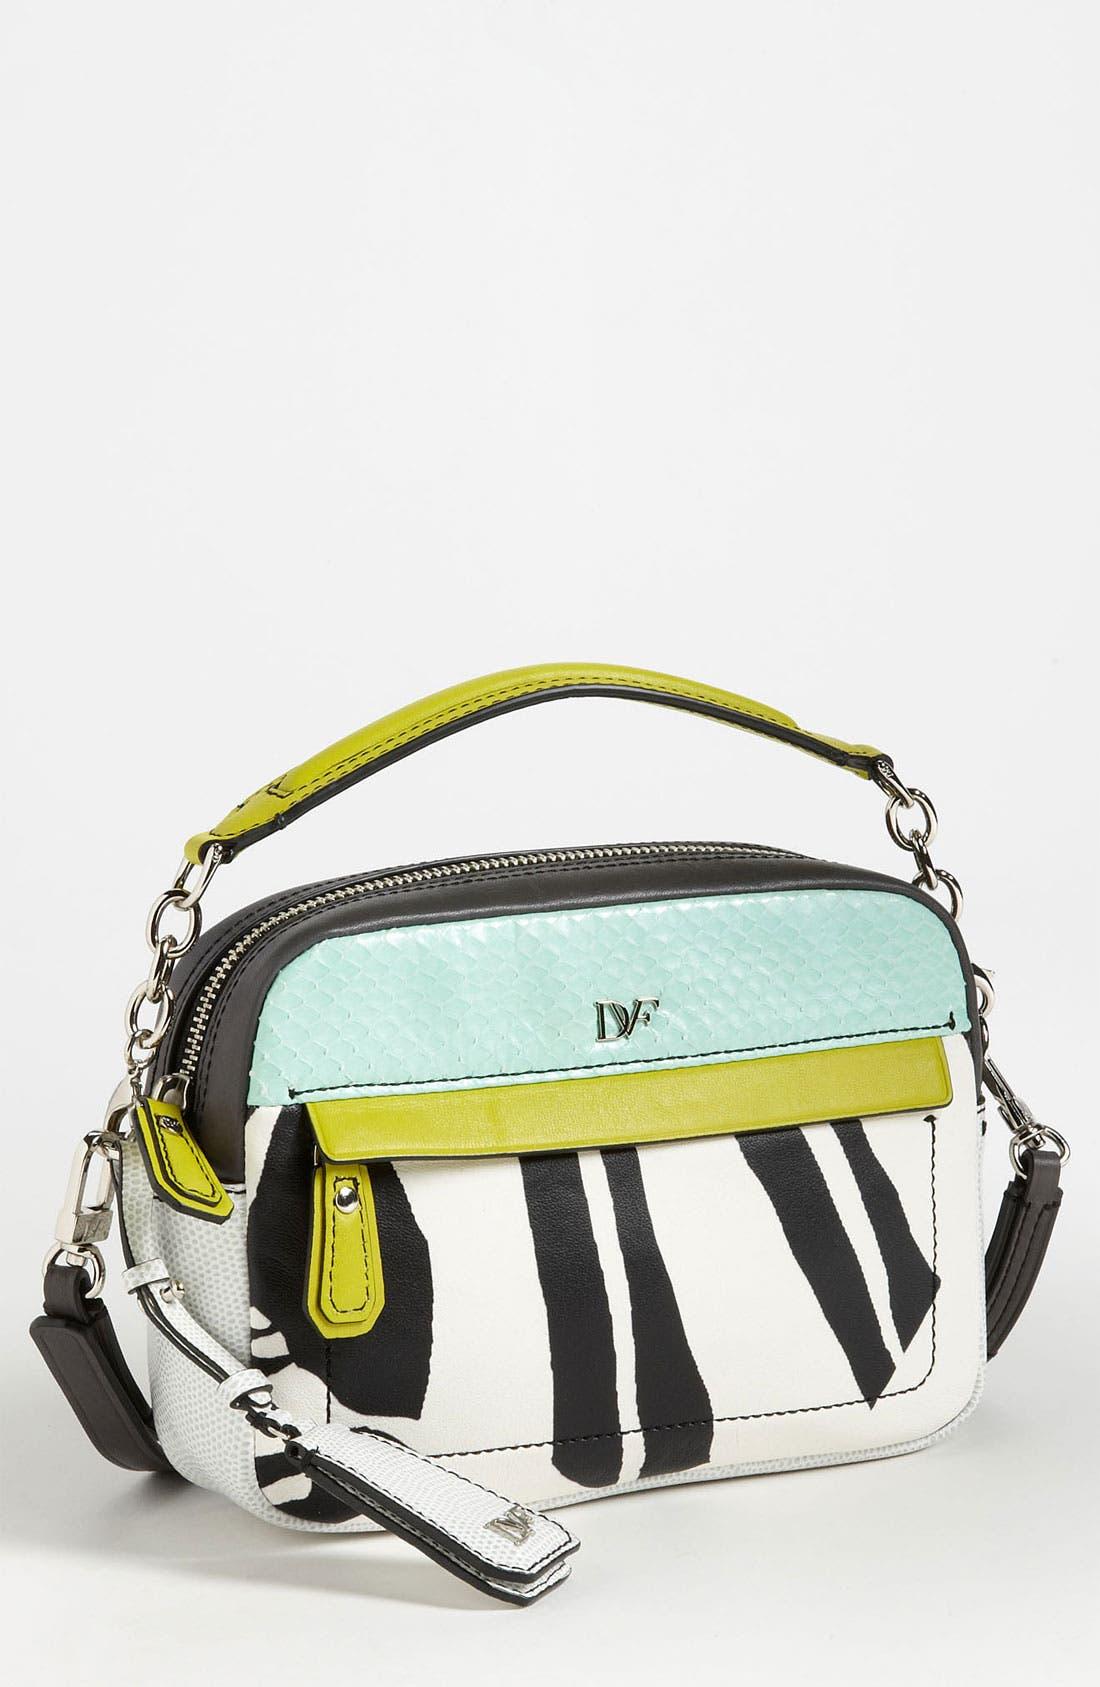 Alternate Image 1 Selected - Diane von Furstenberg 'Milo - Mini' Printed Leather Crossbody Bag